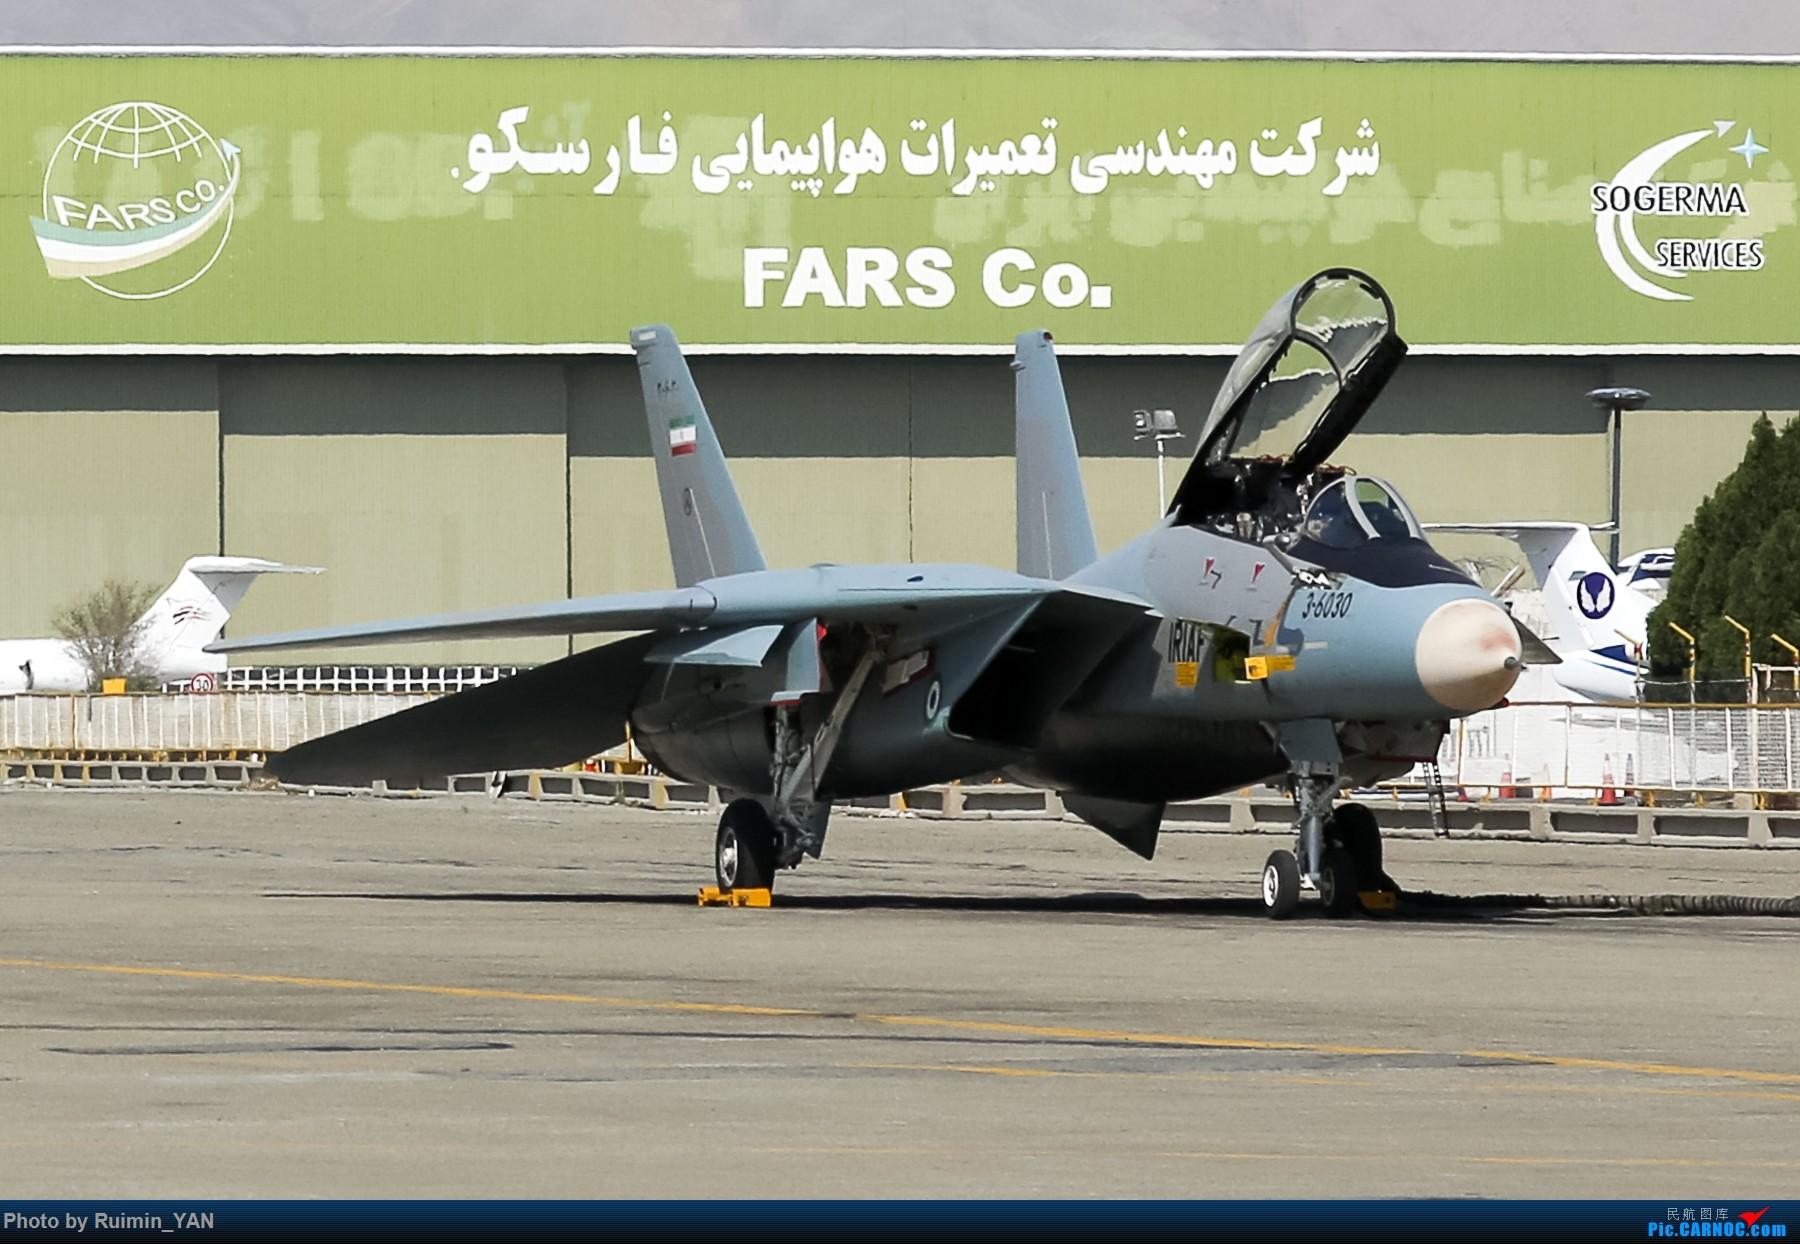 Re:[原创]【THR】(德黑兰梅赫拉巴德机场)伊朗空军(Iran Air Force)-- F-14A(Tomcat雄猫),Su-22M-4,F-4(鬼怪Phantom) F-14A 3-6030 伊朗德黑兰机场